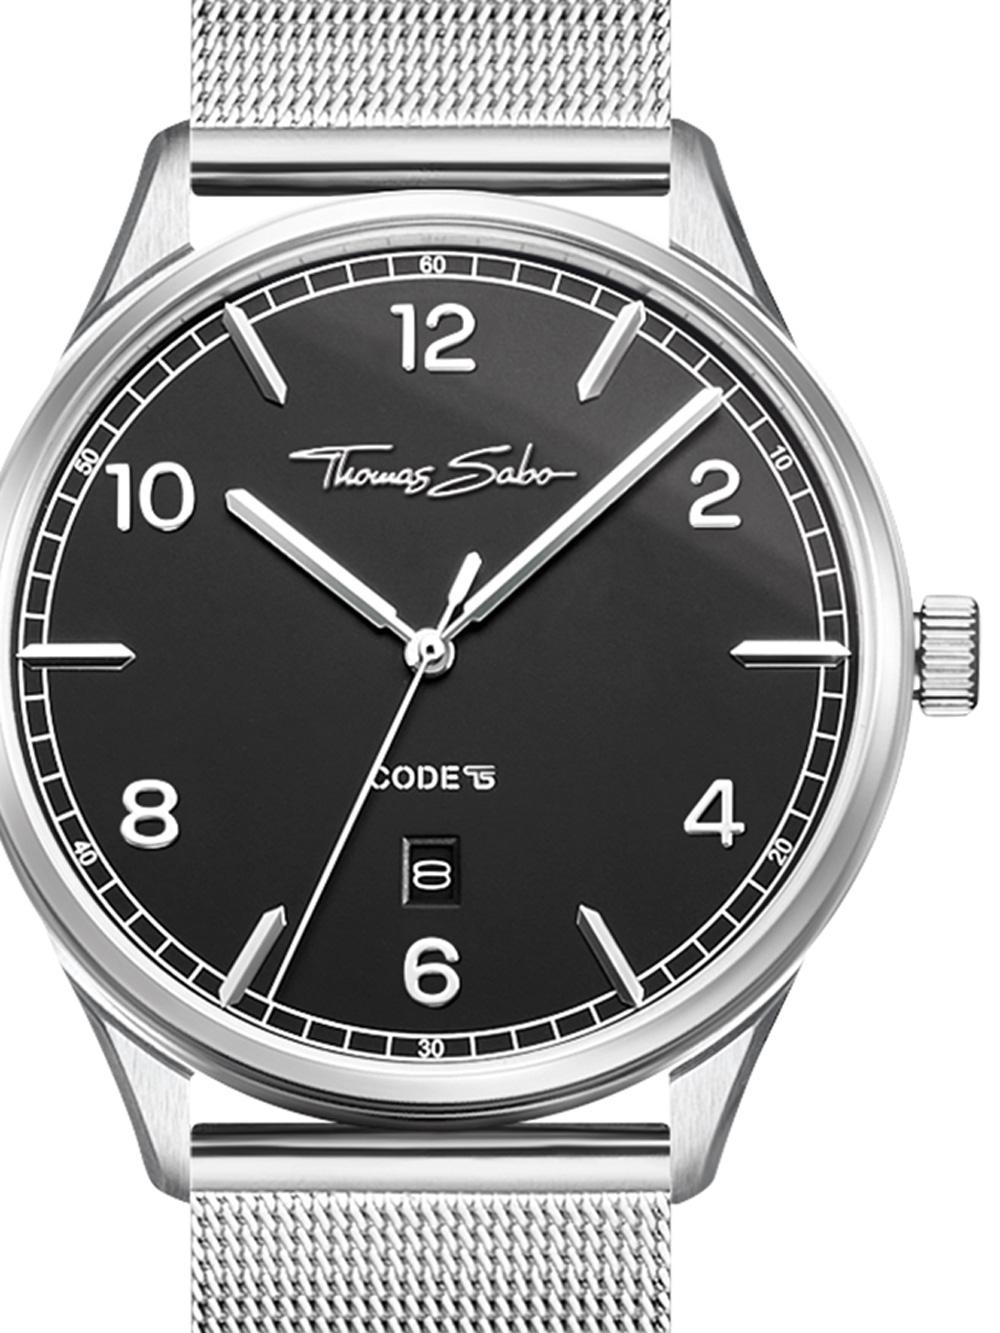 Thomas Sabo WA0339-201-203 Code TS Silber Schwarz Unisex 40mm 3ATM